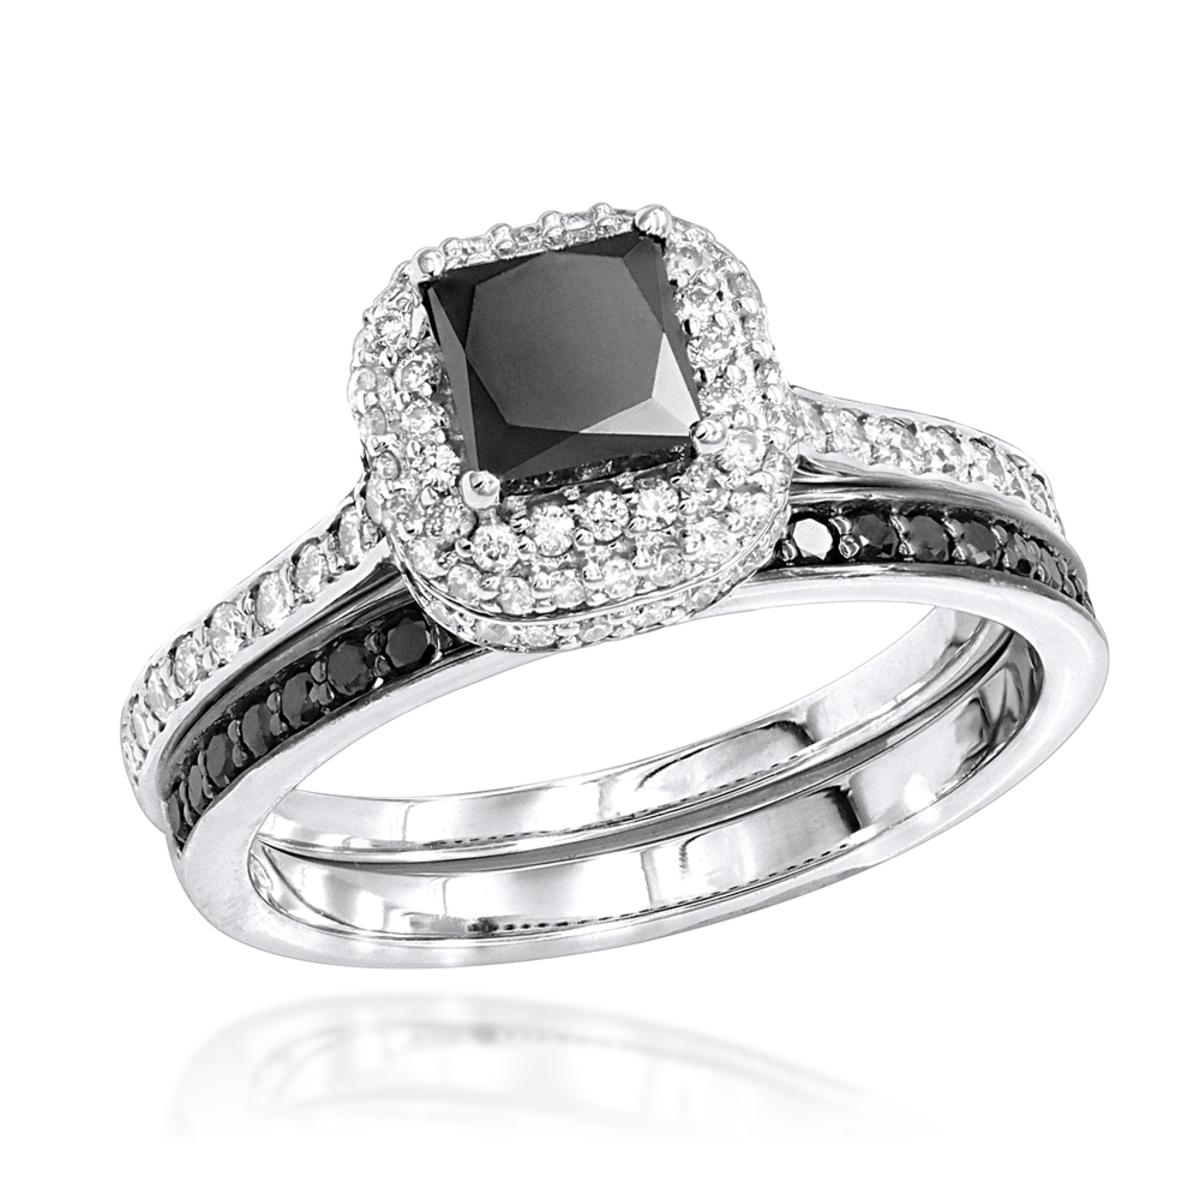 10K Gold White Black Diamond Unique Bridal Engagement Ring Set 1.2ct